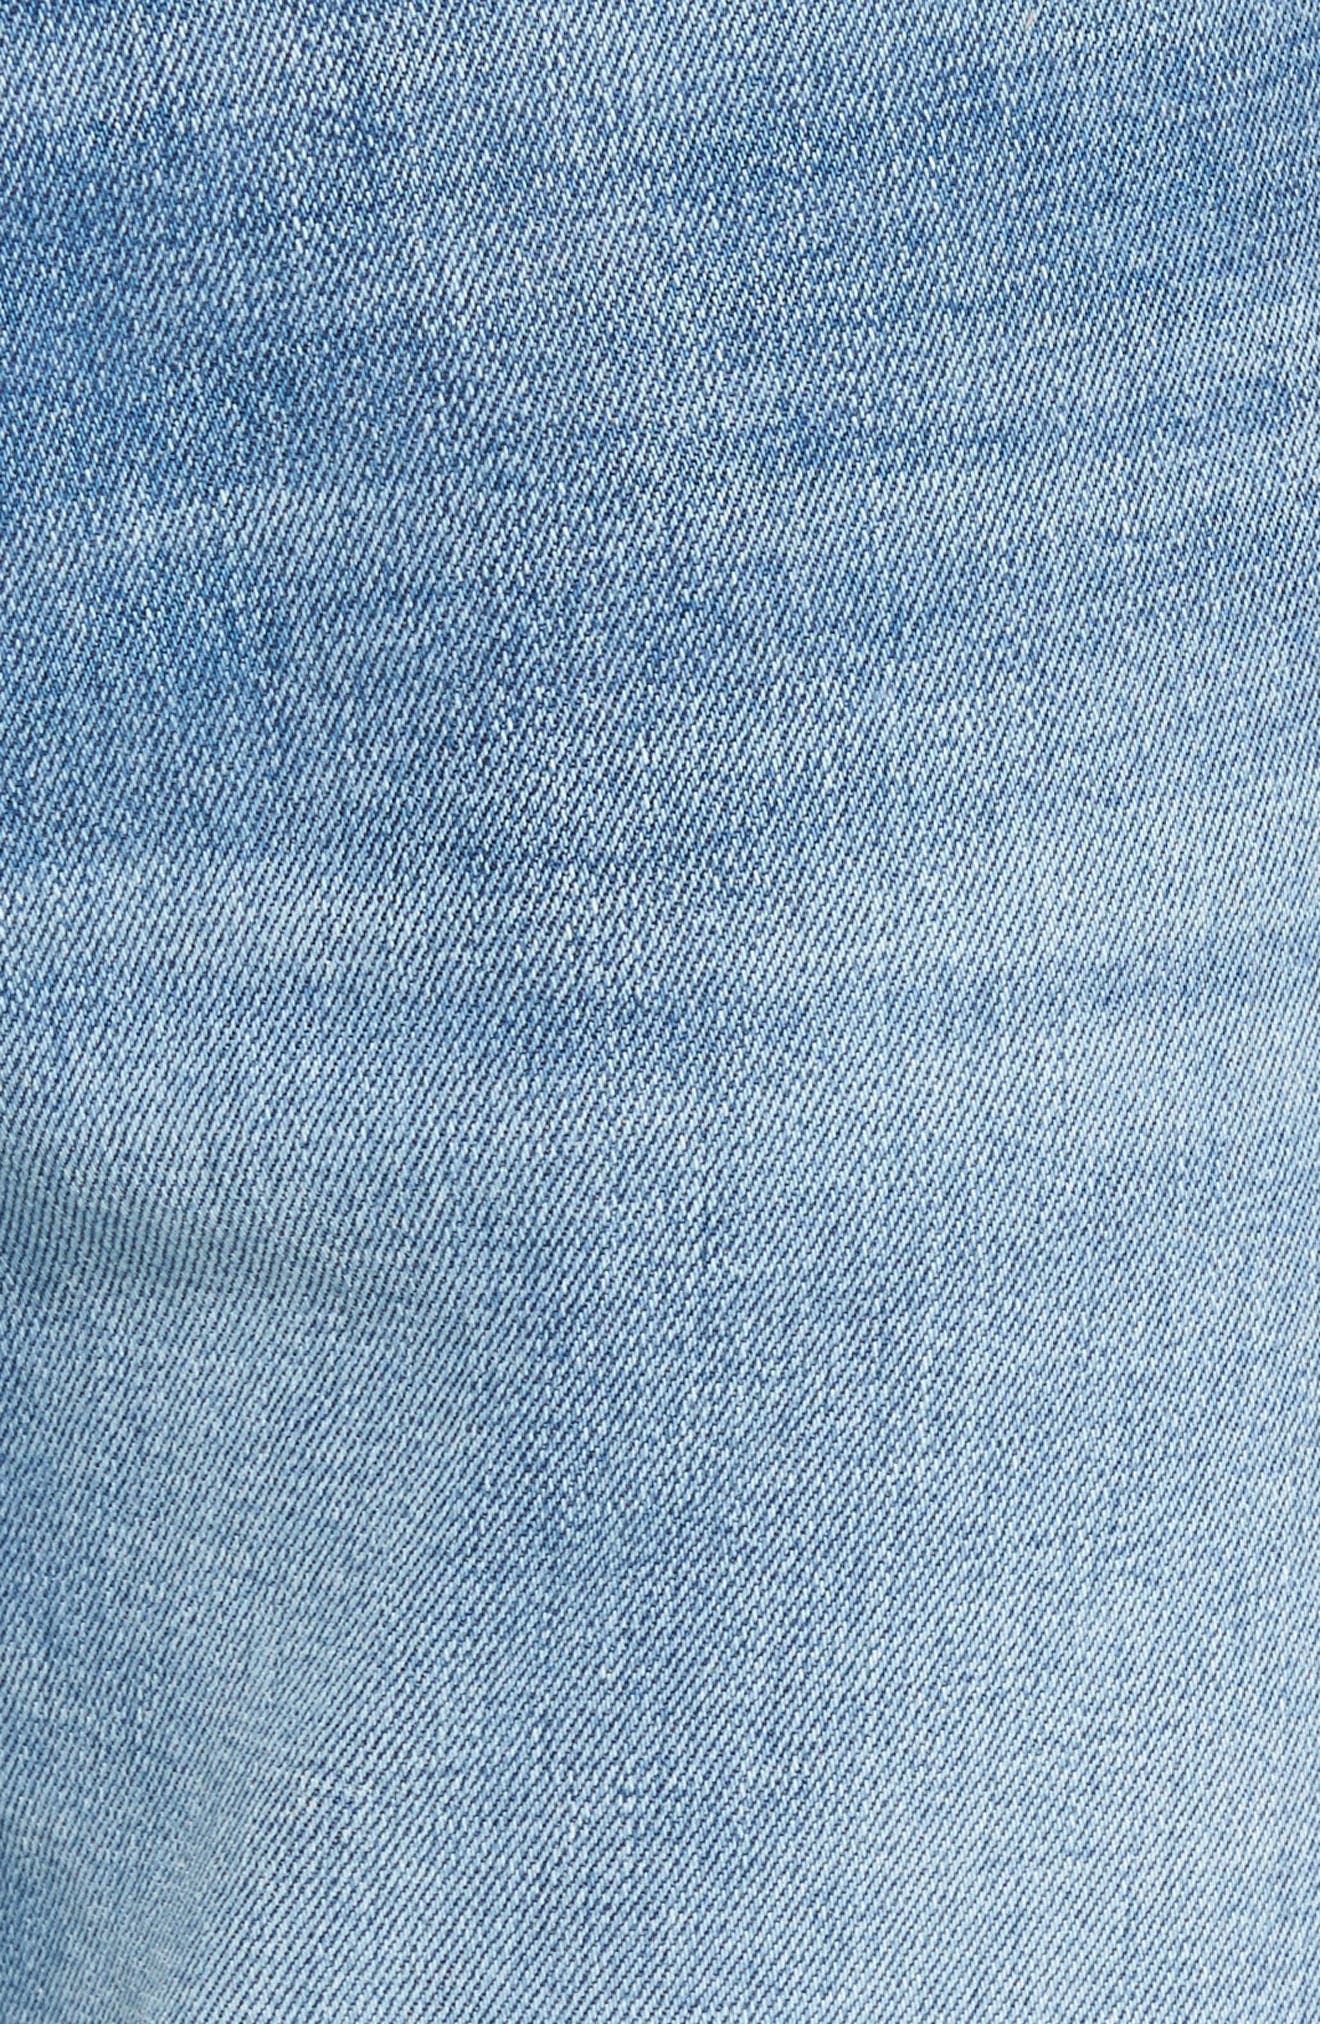 Slim Straight Leg Jeans,                             Alternate thumbnail 5, color,                             LIGHT WASH